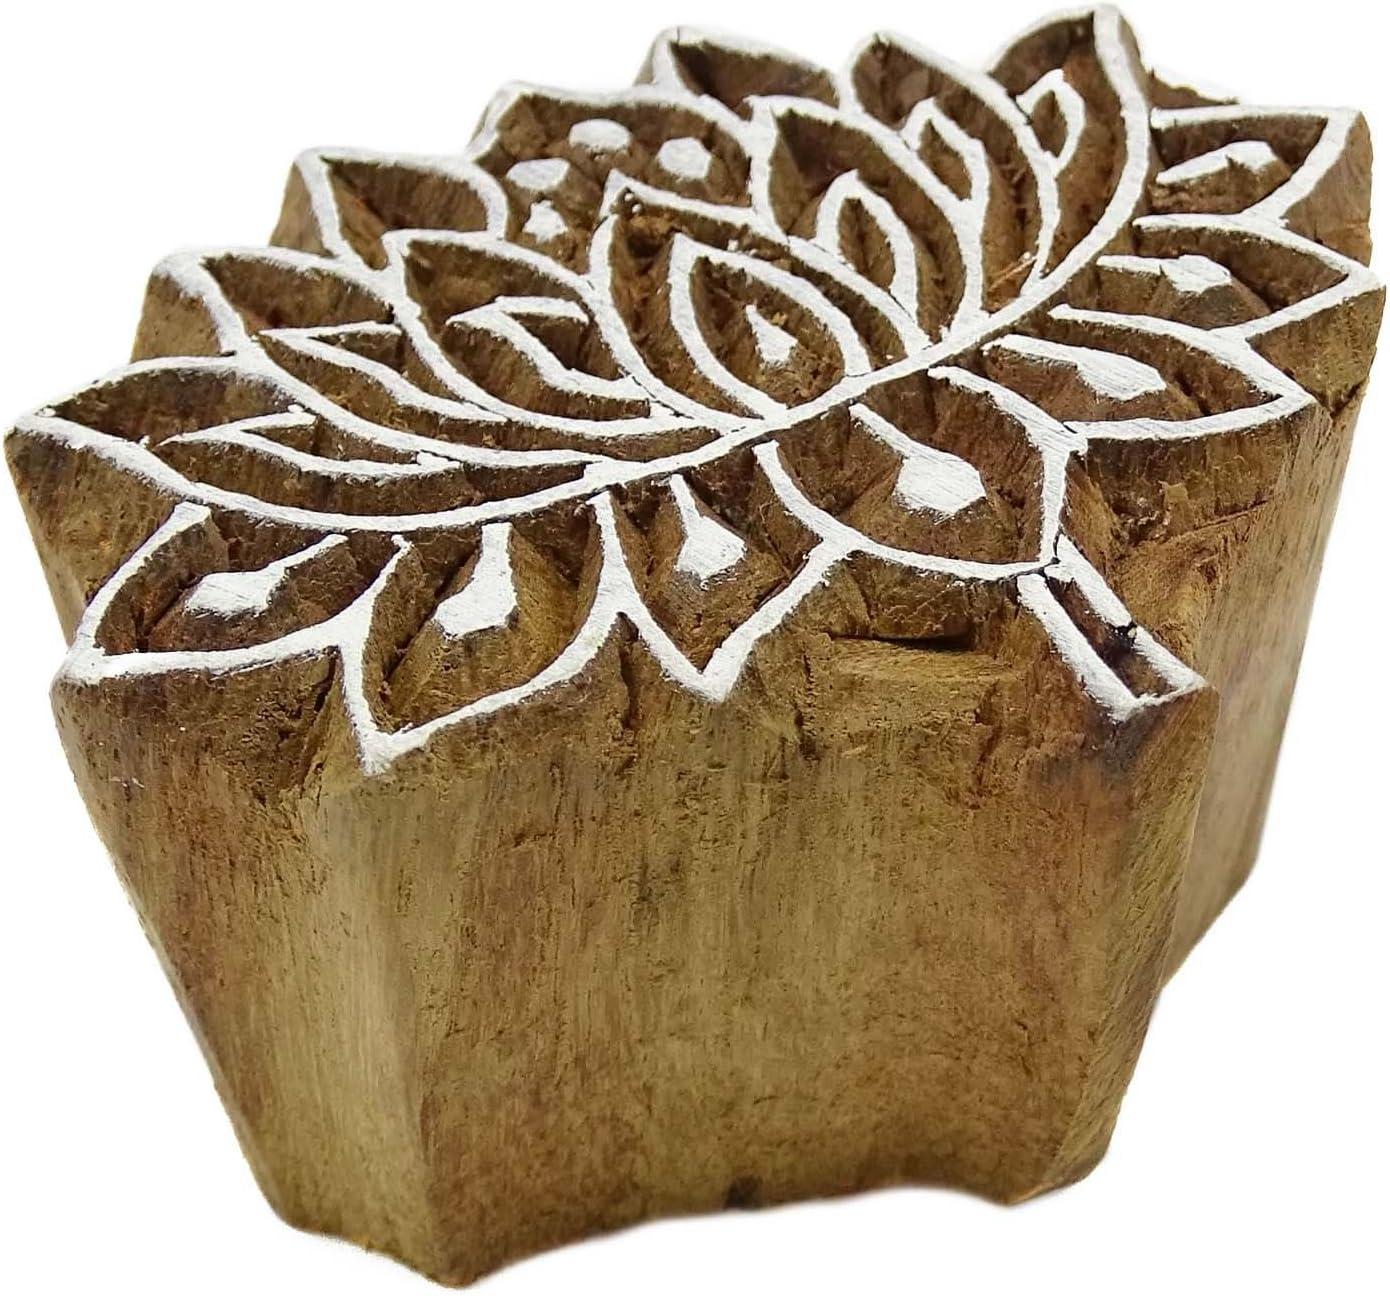 Lotus Pattern Wooden Hand Printing Block Carved Blocks Textile Print Stamps